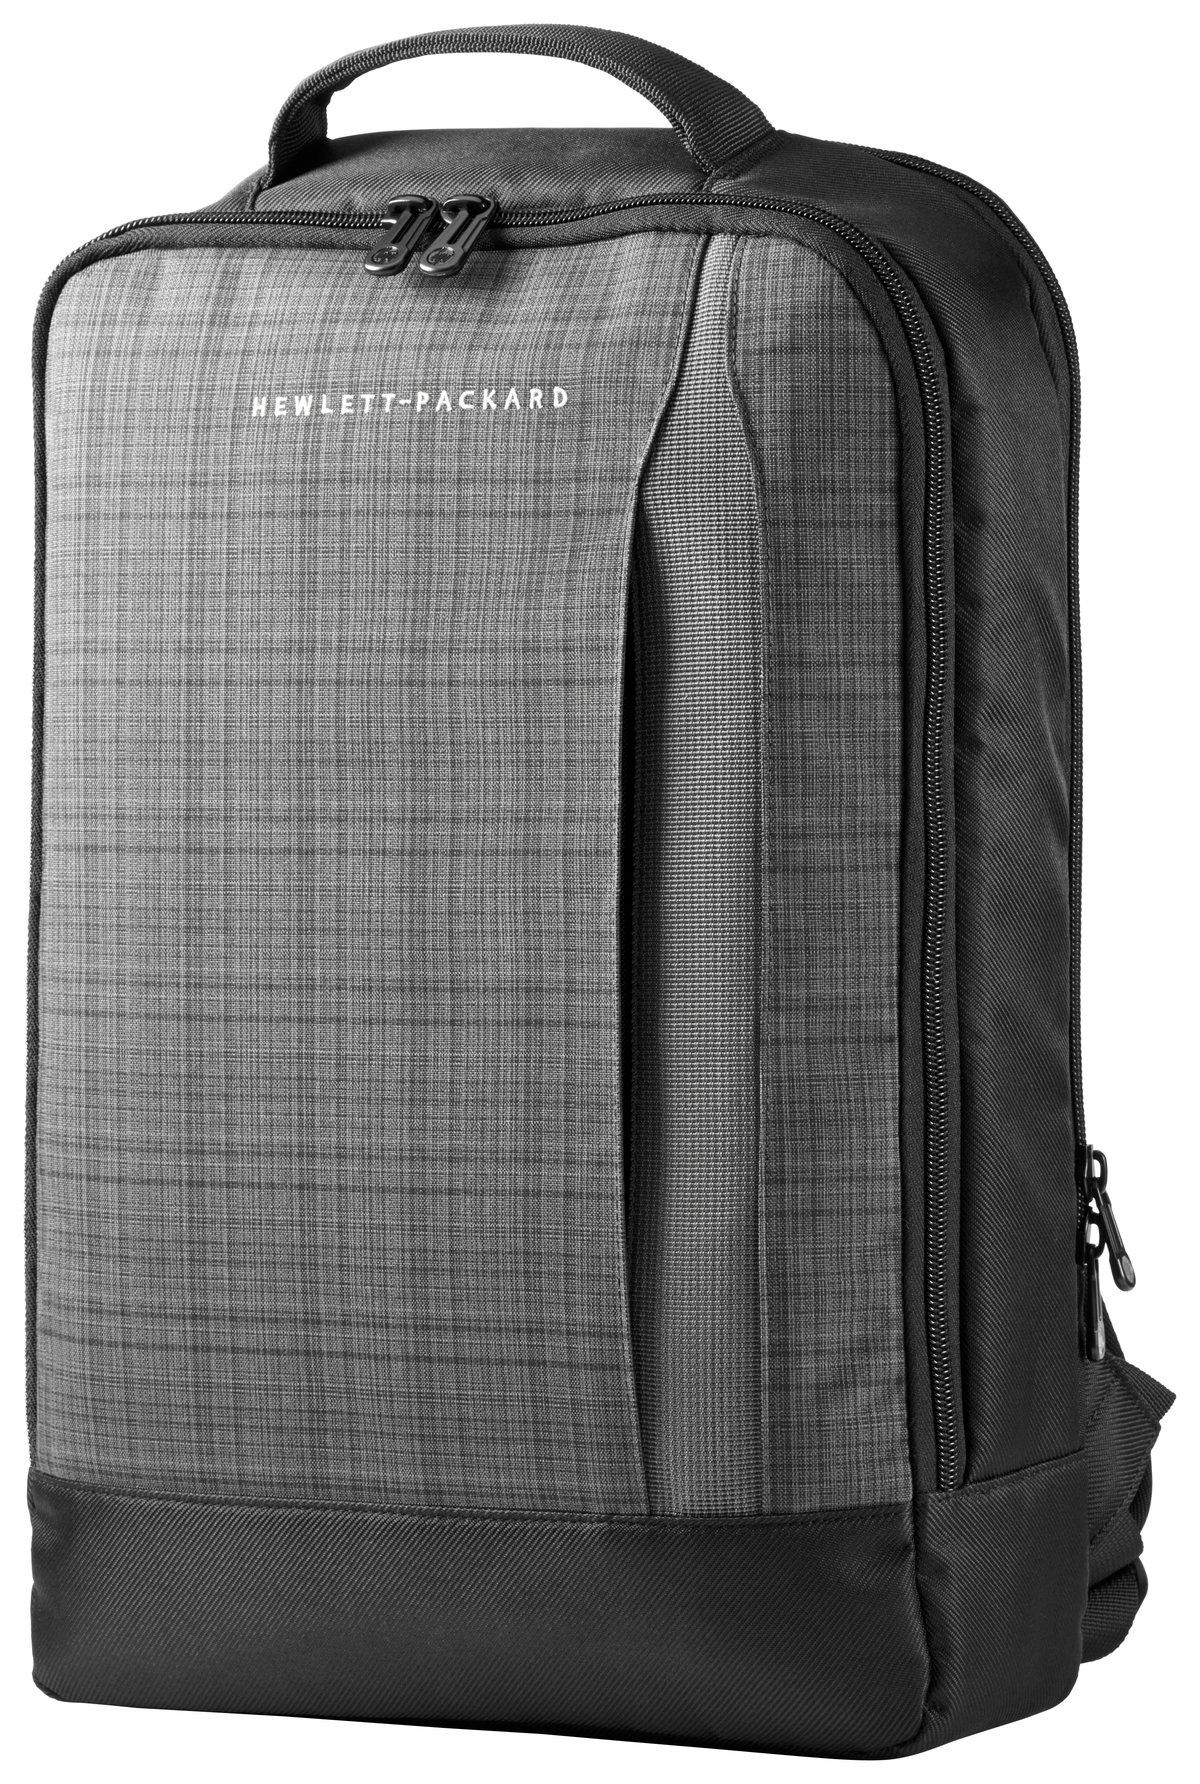 b268b2a73e HP Slim Ultrabook Backpack sac à dos pour ordinateur portable (F3W16AA)